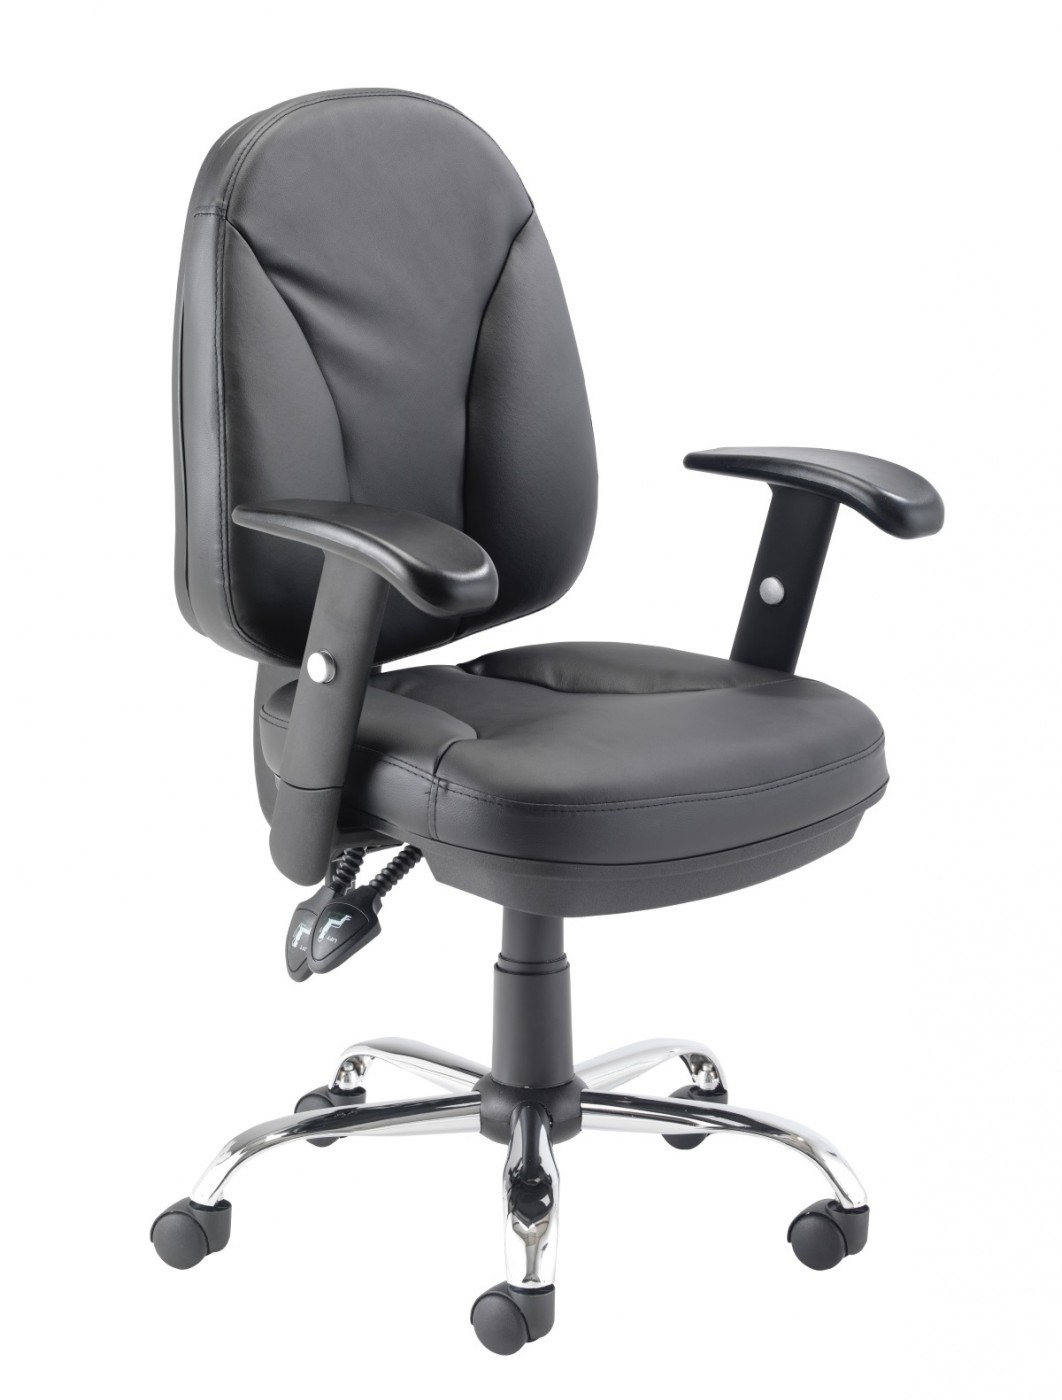 Office Chairs Tc Puma Black Office Chair Ch1003 121